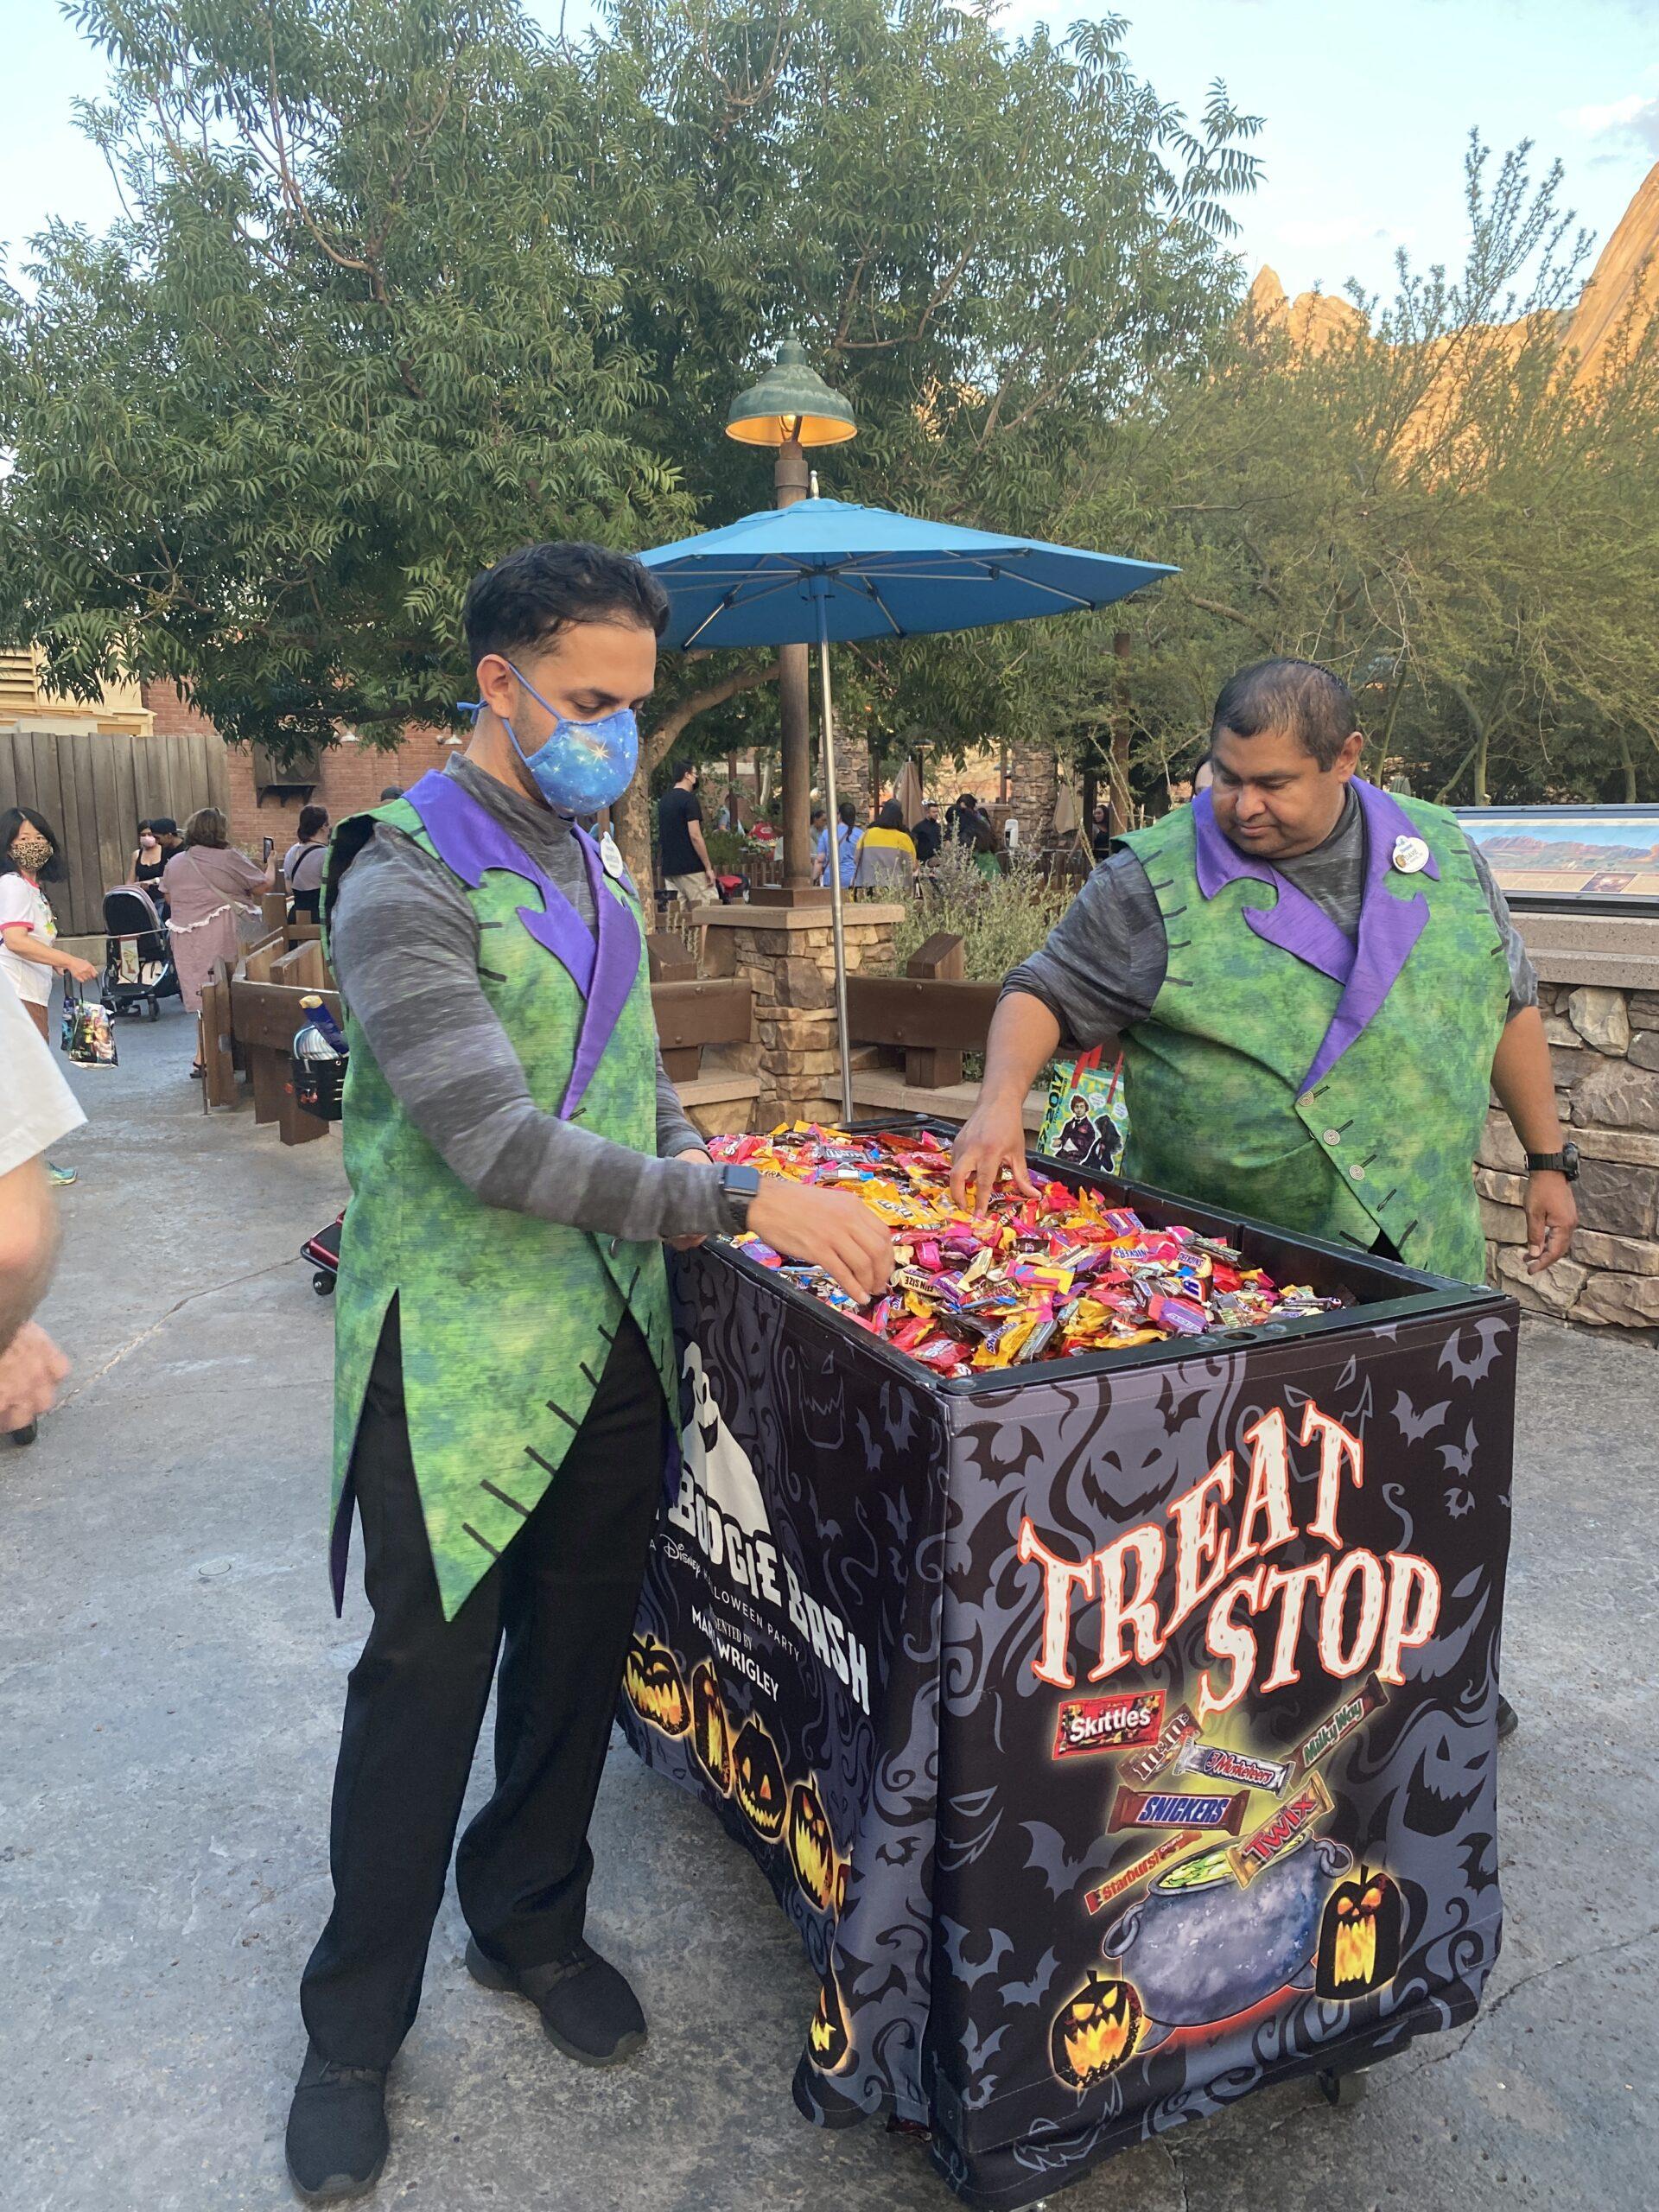 Disney cast member handing out treats